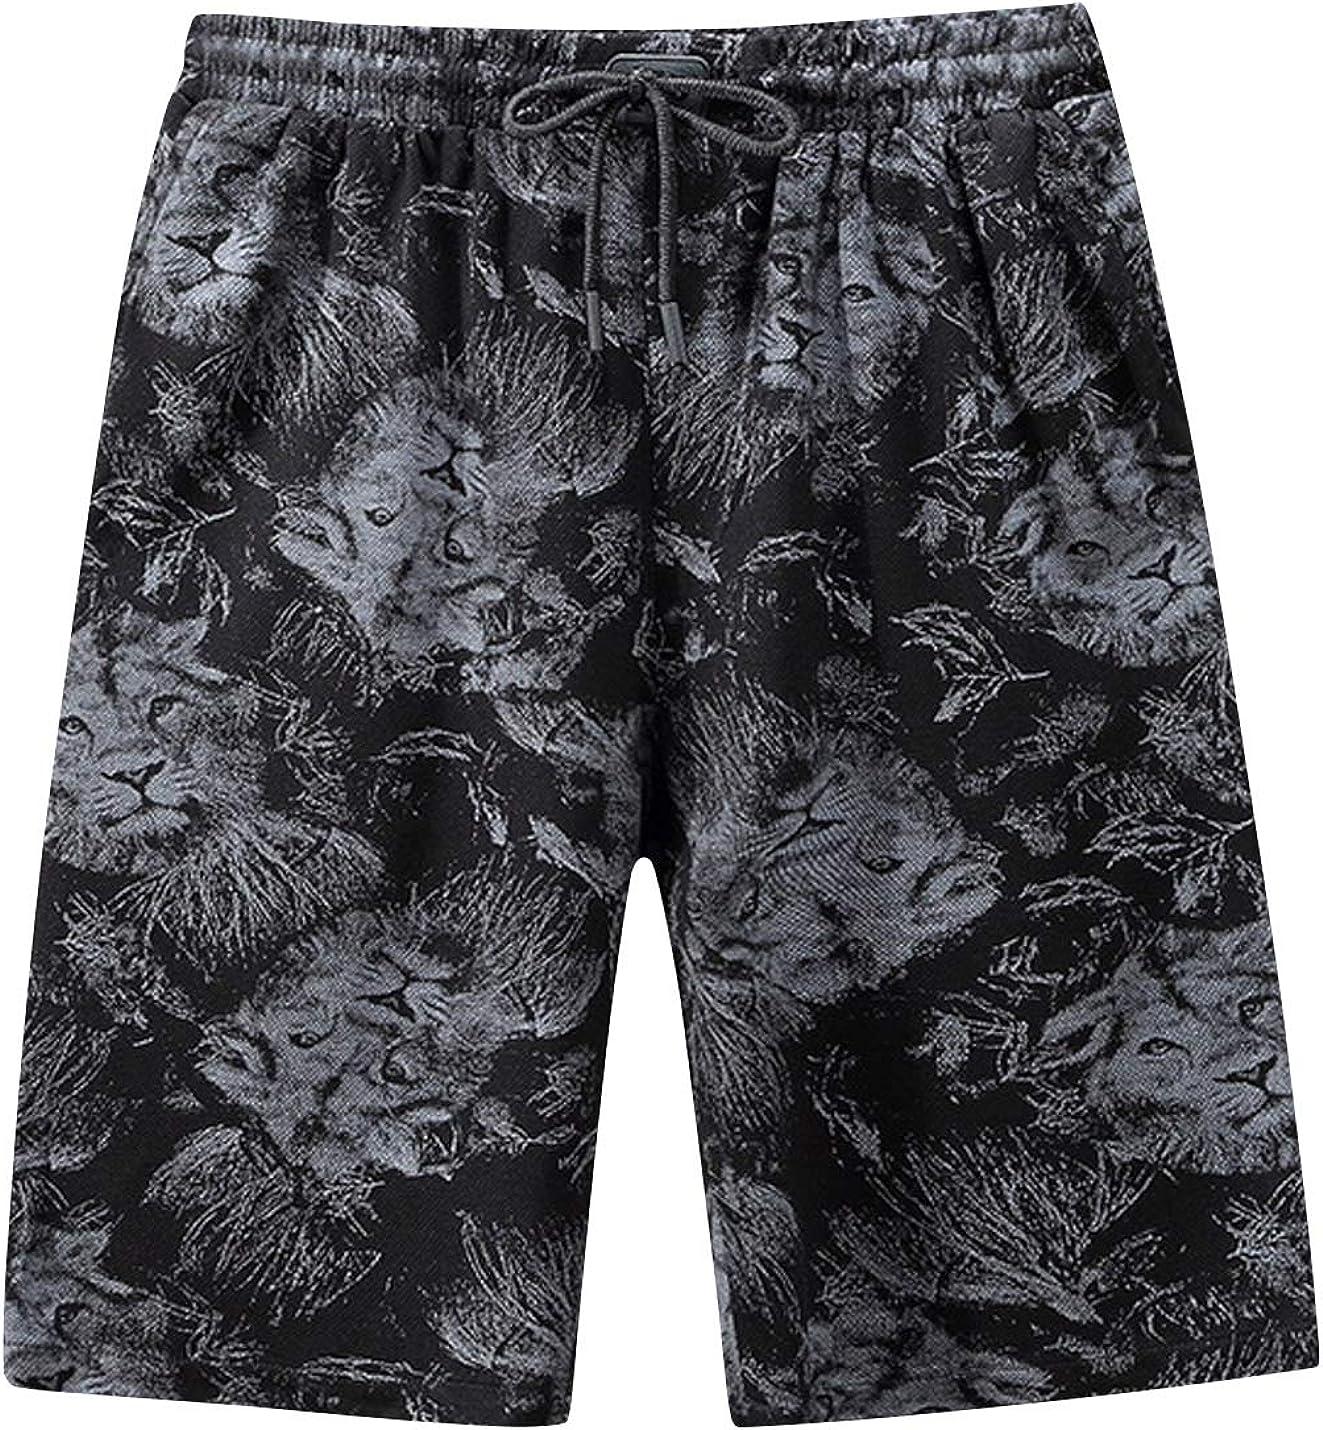 ZGZZ7 Men's Vintage Camouflage Shorts Mid Waist Wide Leg Printed Sport Running Active Short Pants